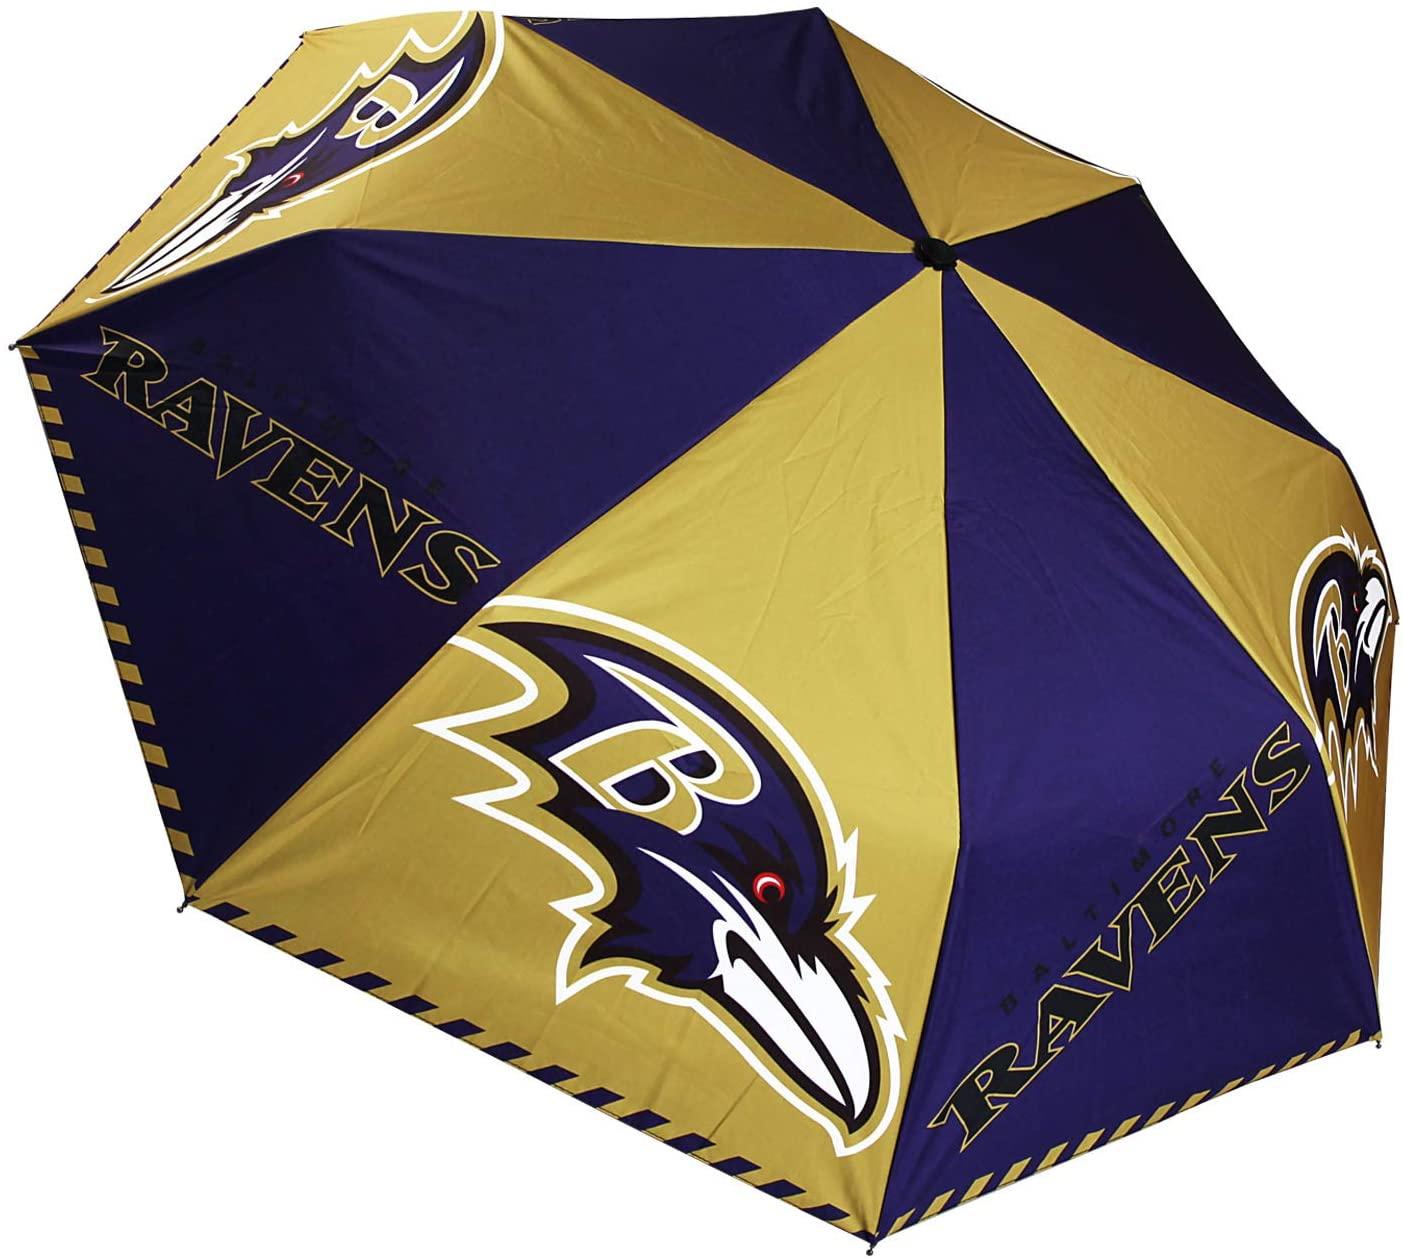 MT-Sports Football Team Folding Umbrella 8 Ribs Anti-UV Sun Waterproof Windproof Straight Travel Small Compact Portable Umbrella for Car Rain Outdoor Use